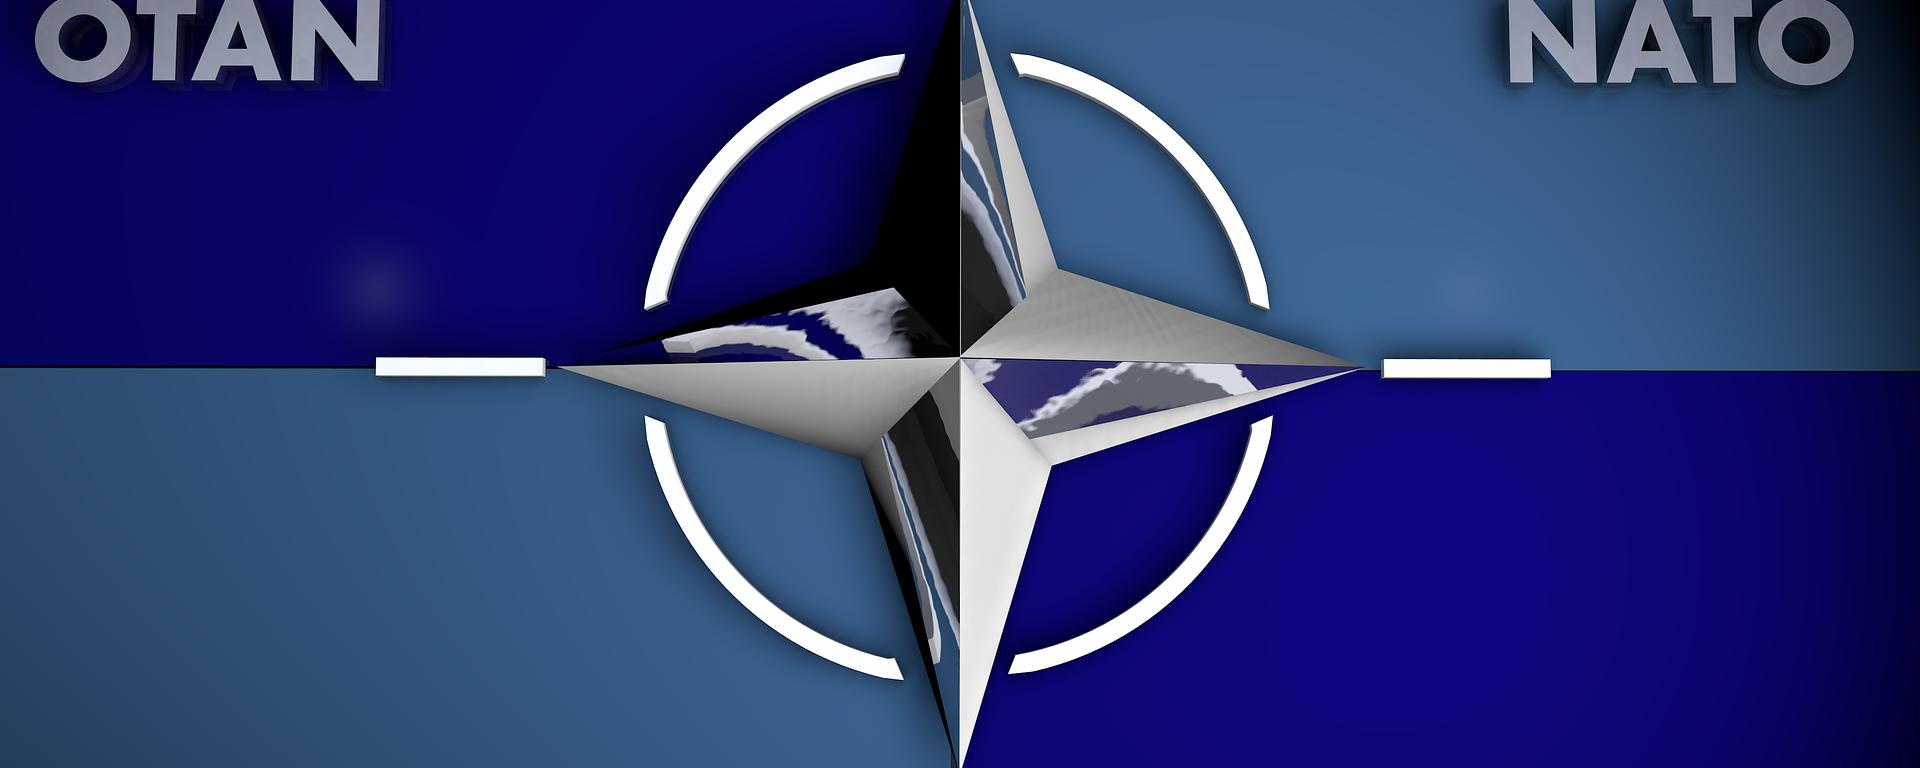 Logo OTAN - Sputnik Mundo, 1920, 05.10.2021